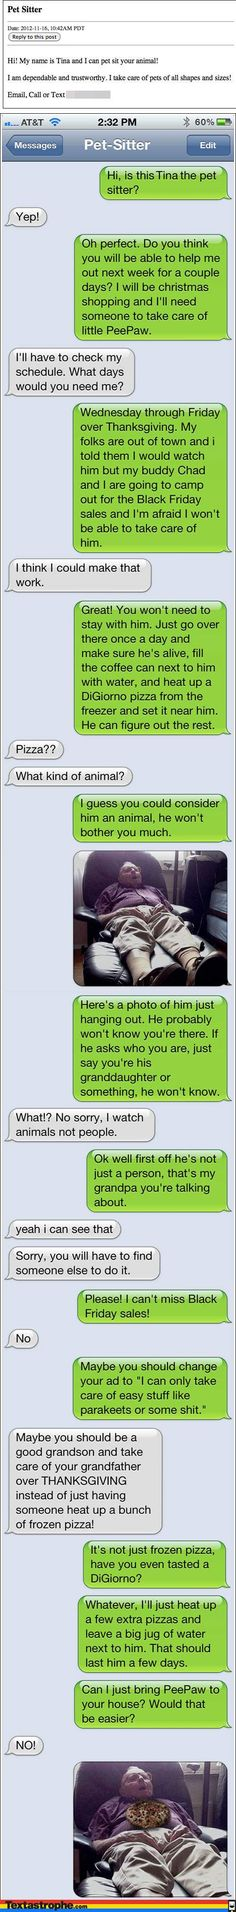 texting pranks textastrophe